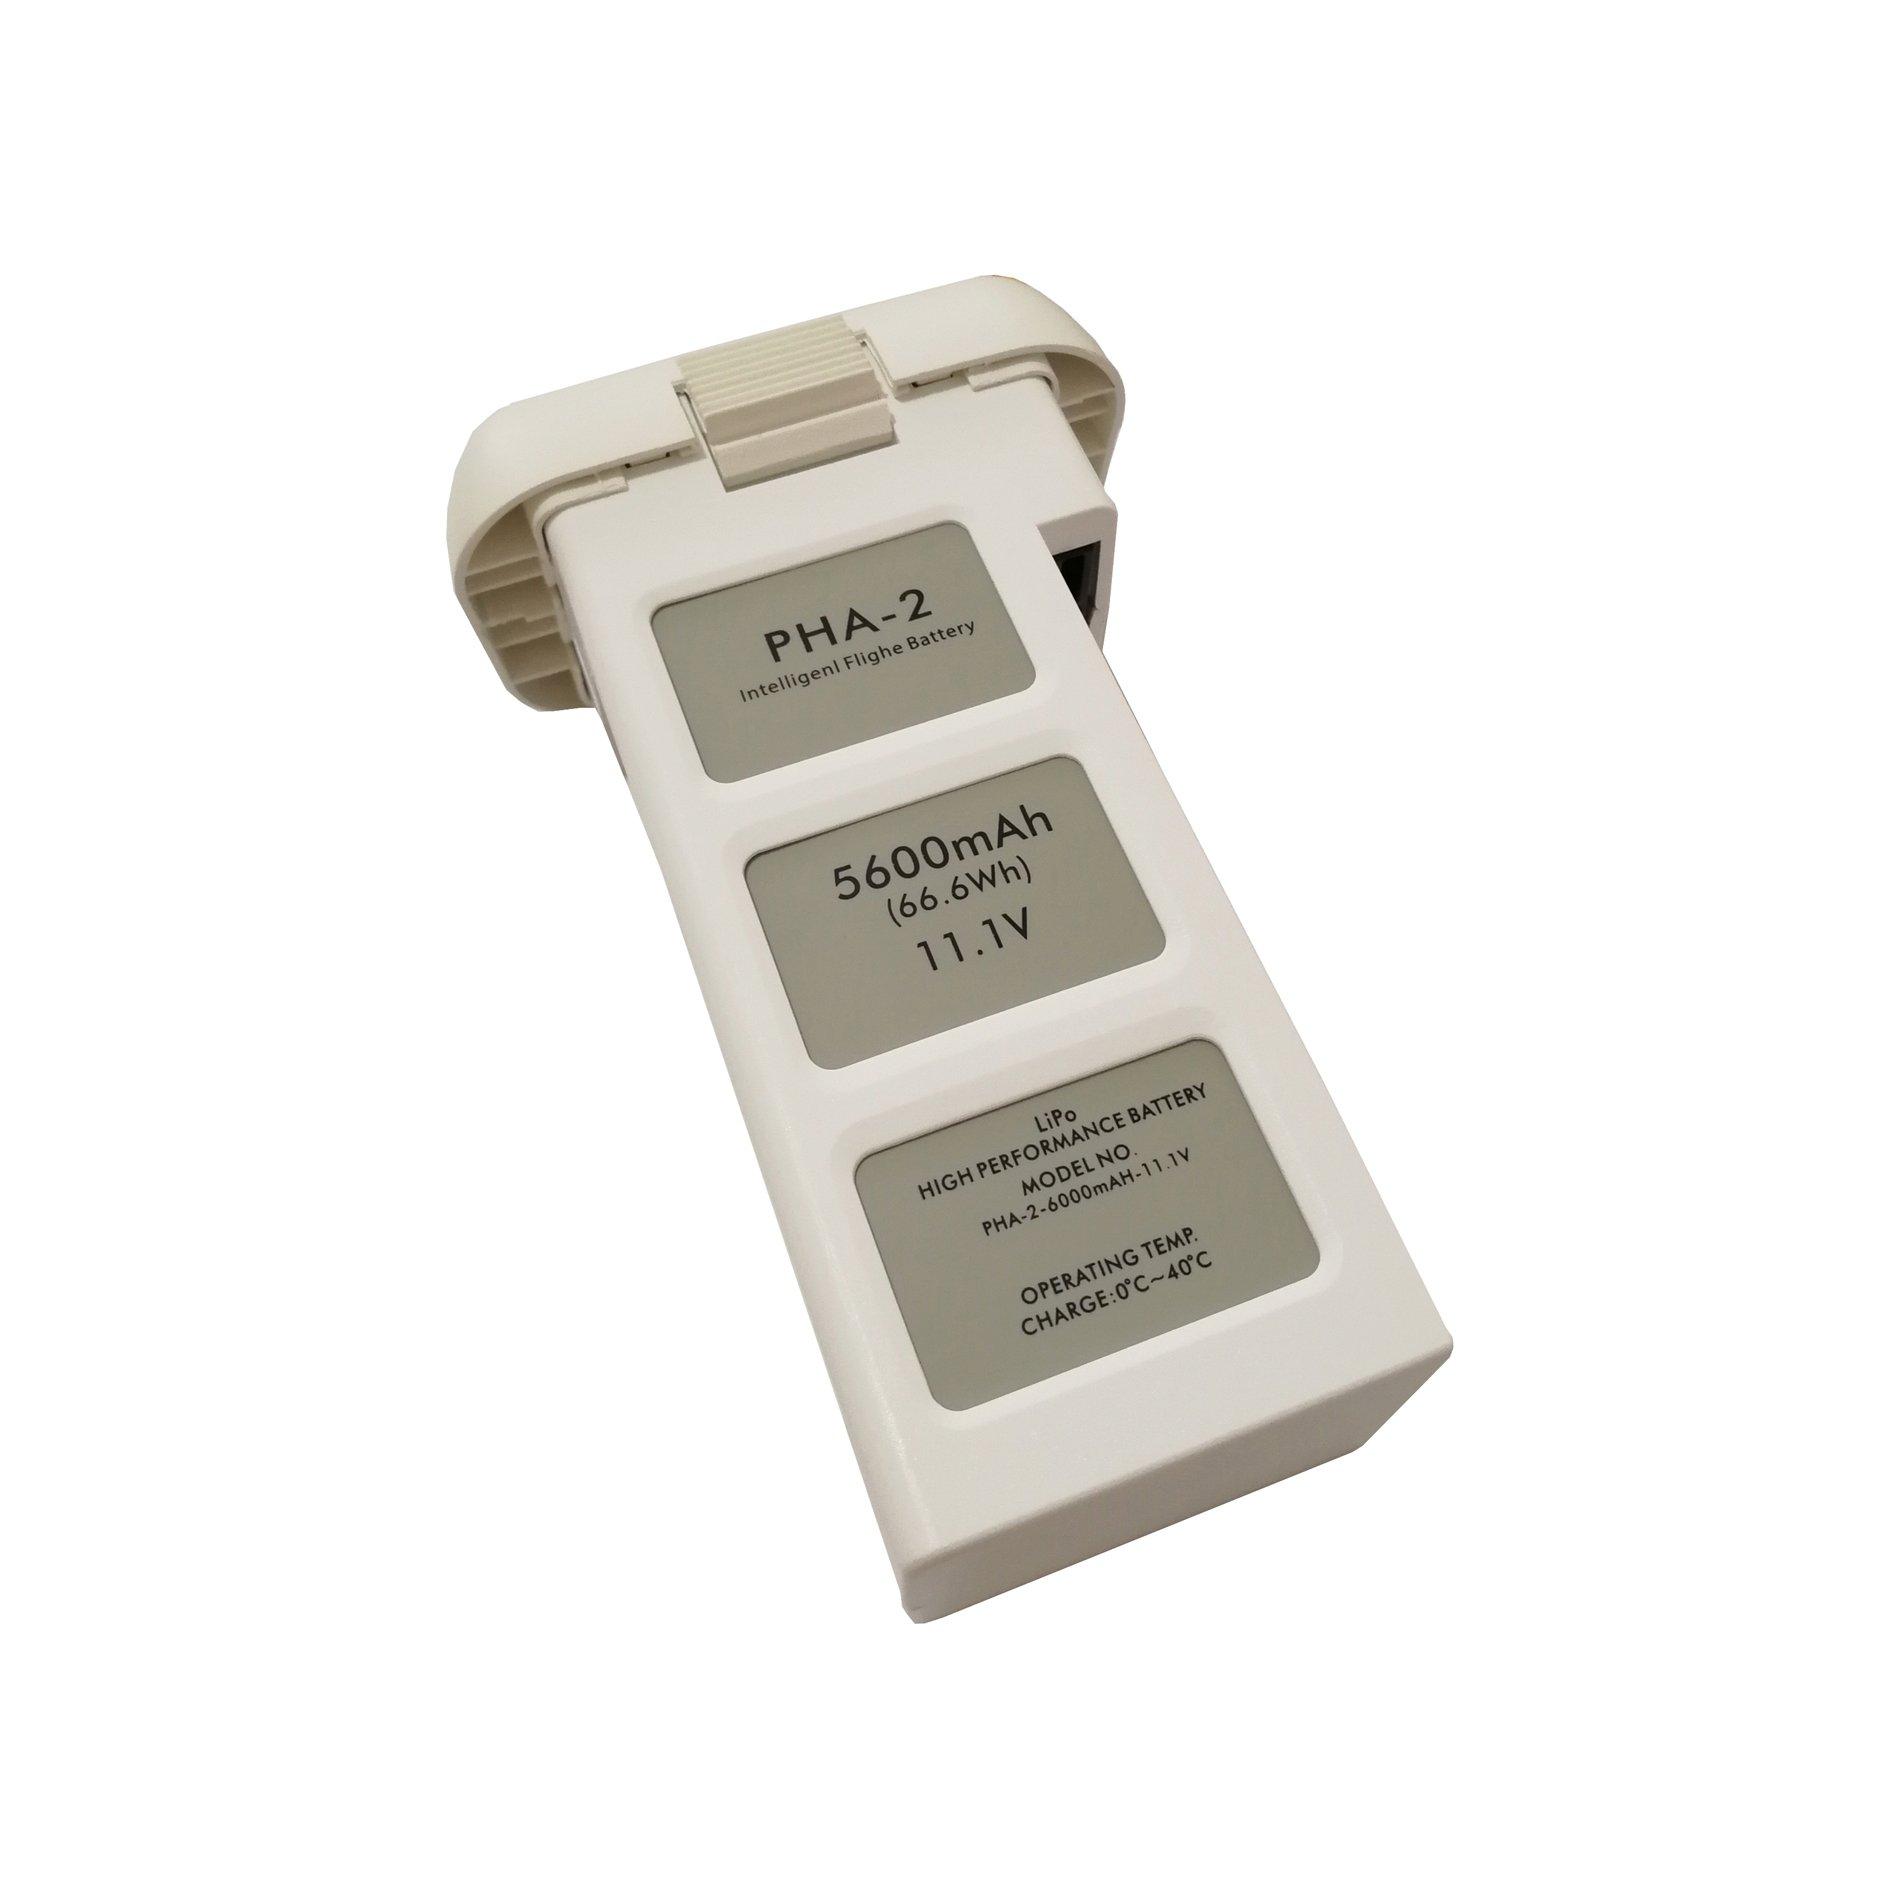 IDS Home 5600mAh Intelligent Flight Battery for DJI Phantom 2 & DJI Phantom 2 Vision+Drone Battery